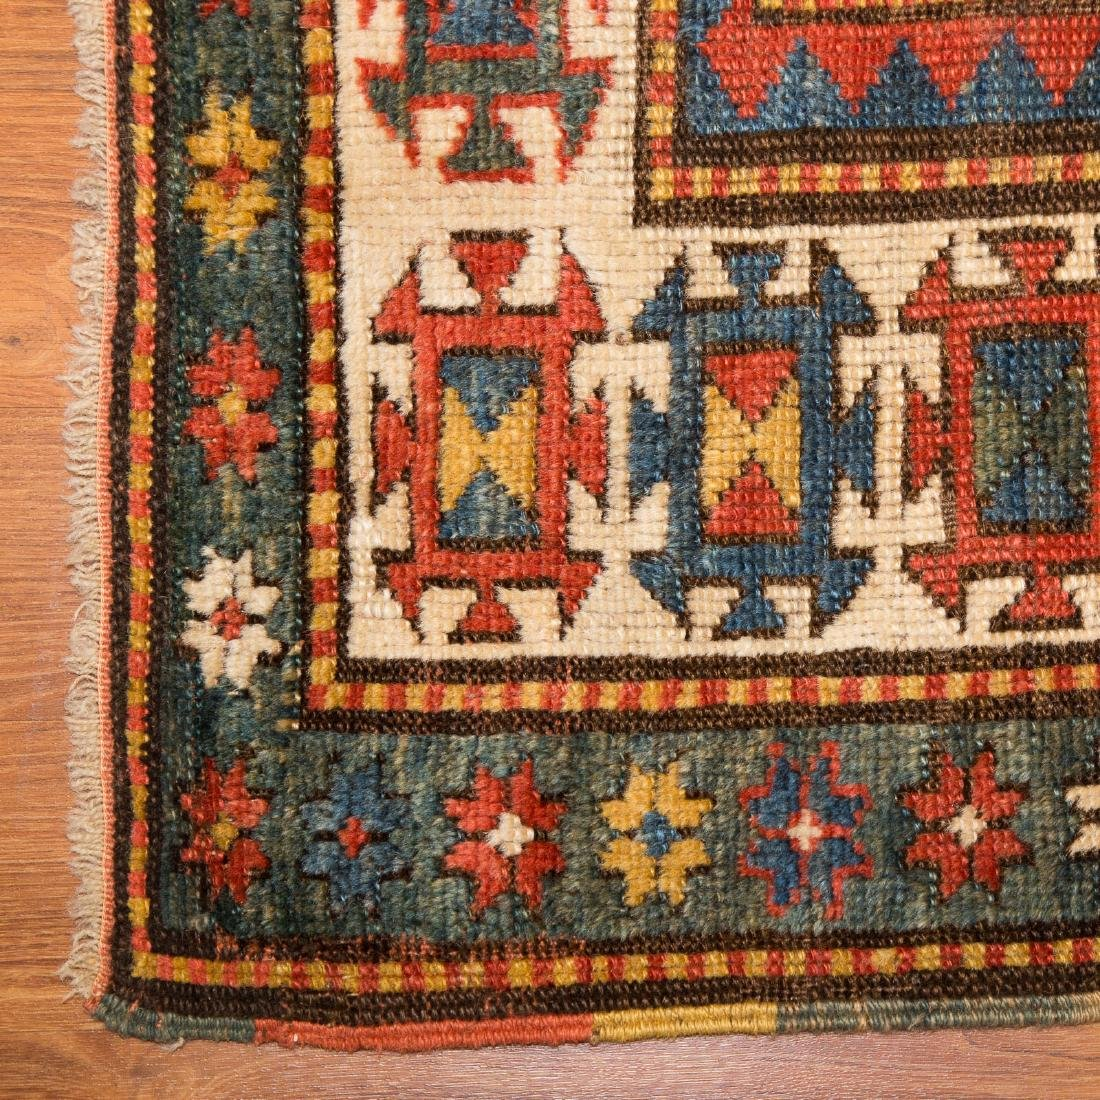 Antique Kazak rug, approx. 3.9 x 5.4 - 2